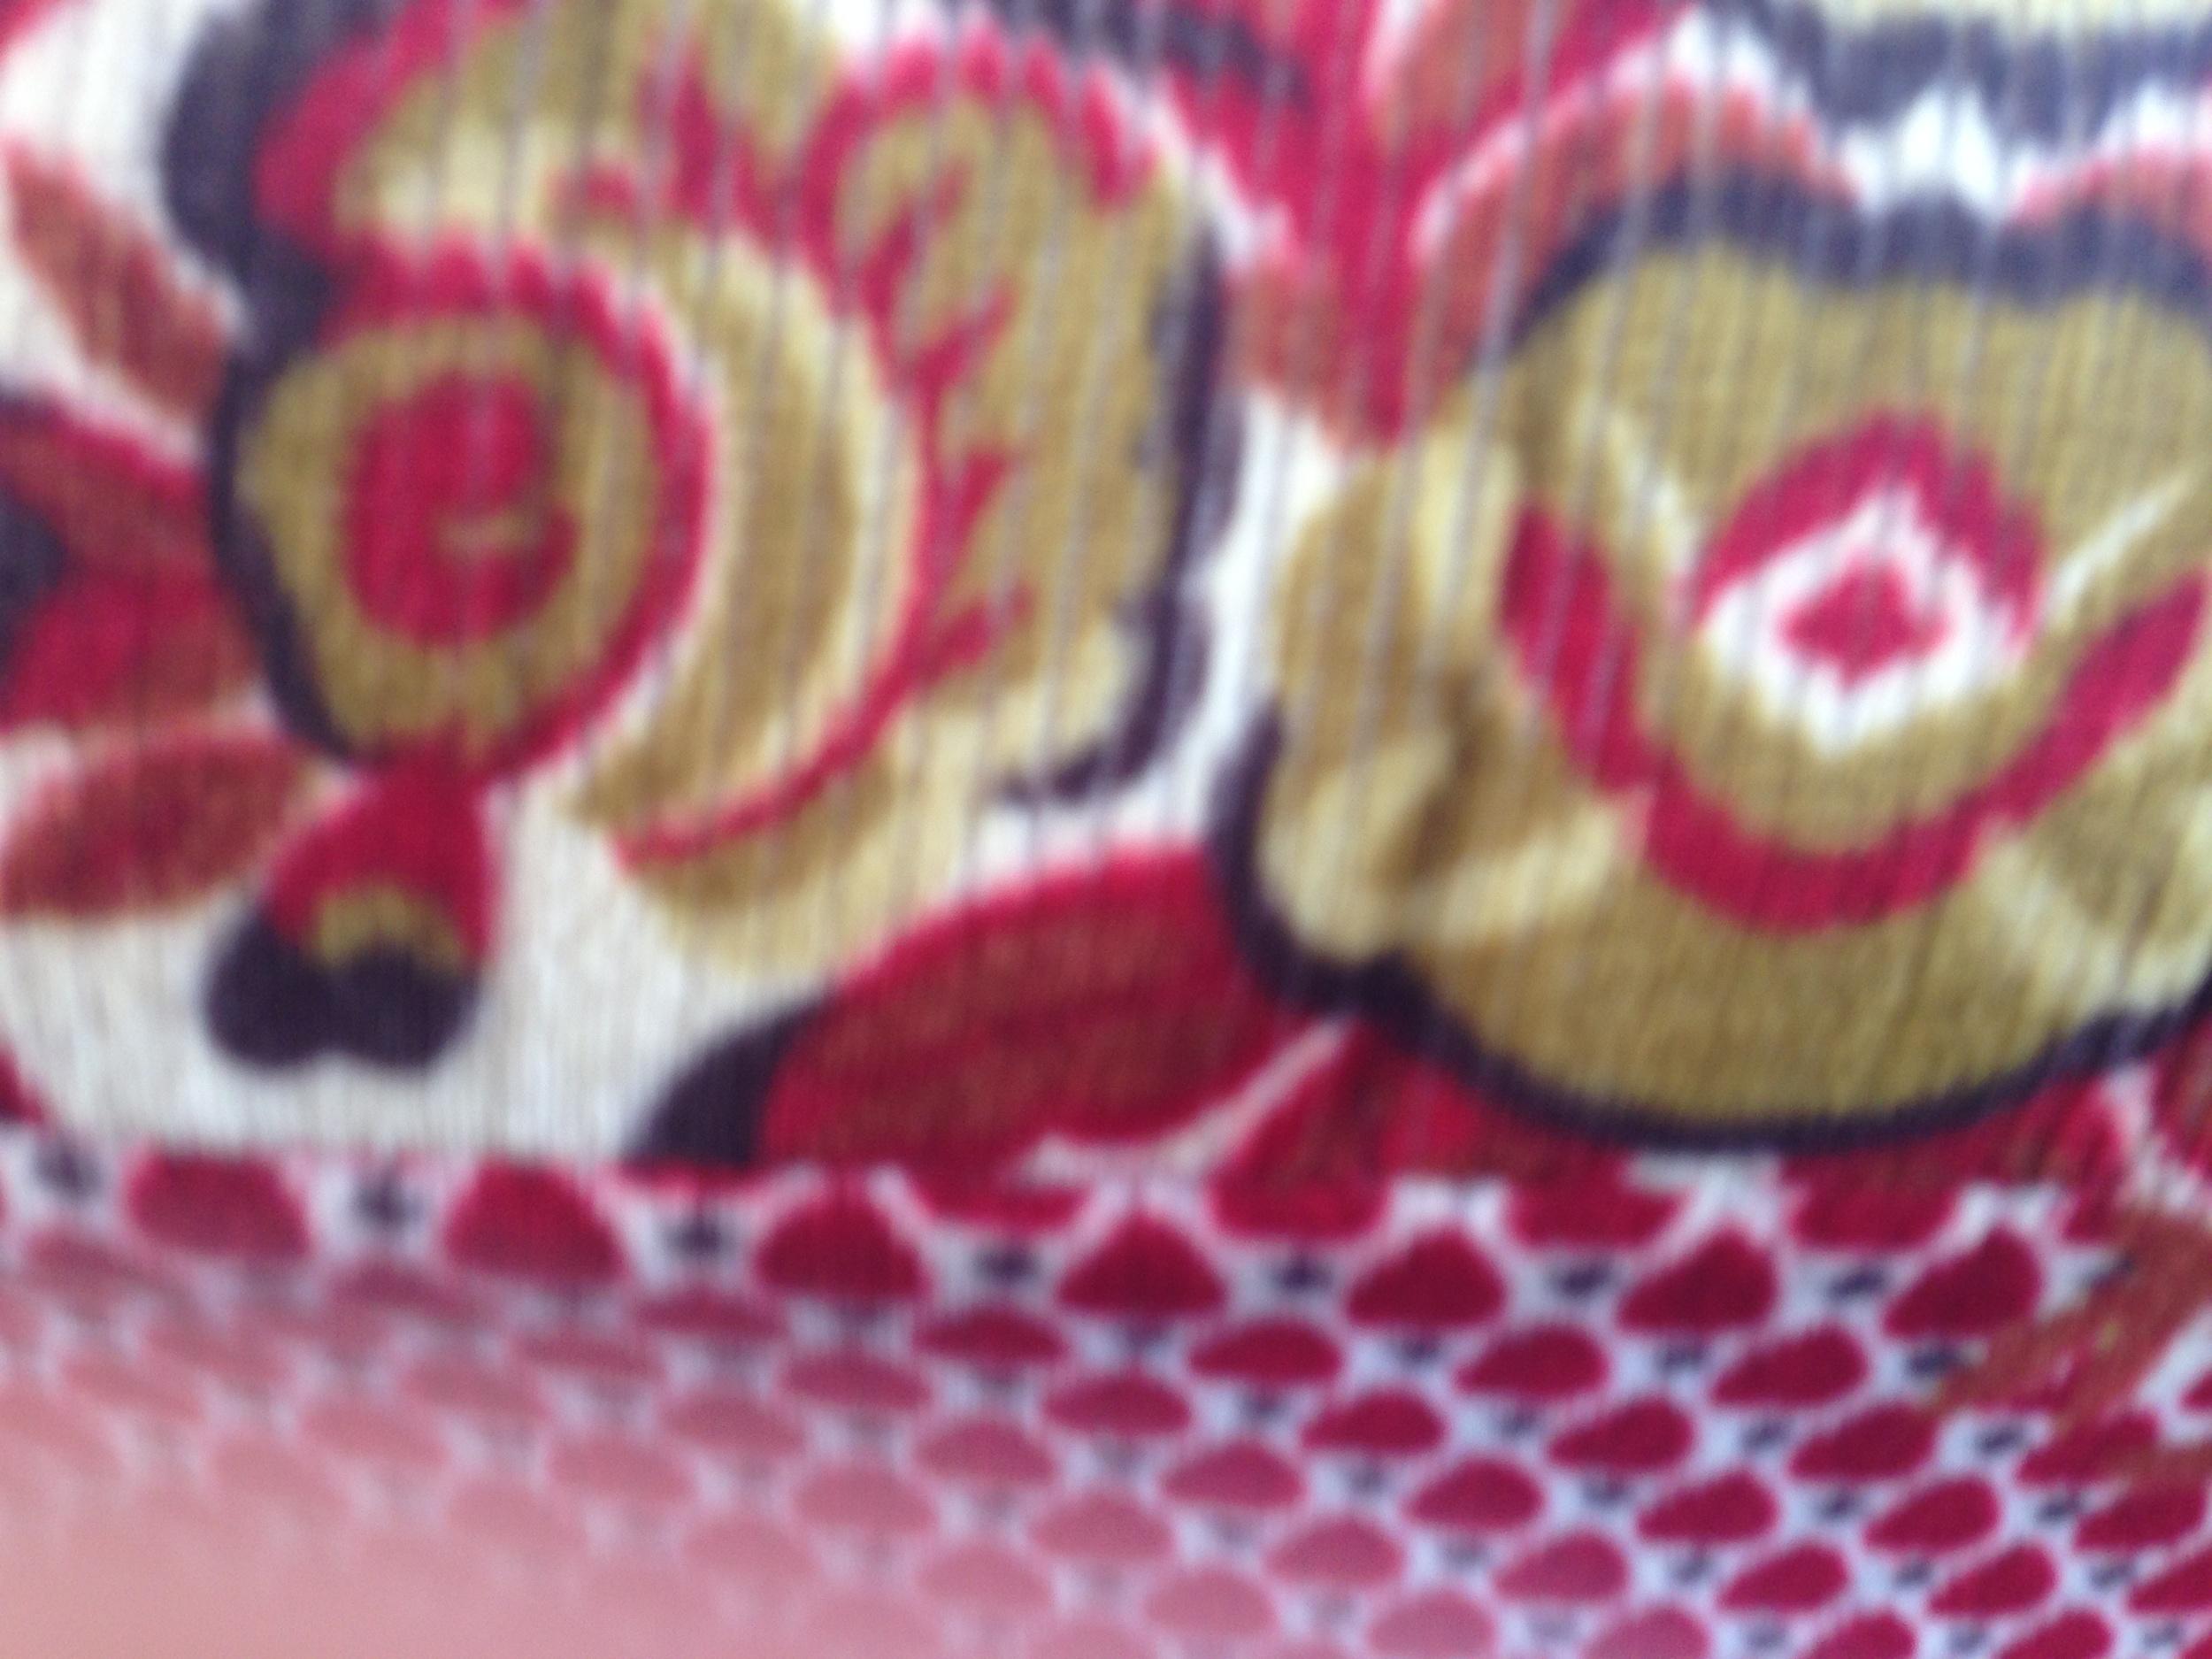 Upholstery in a tuk-tuk